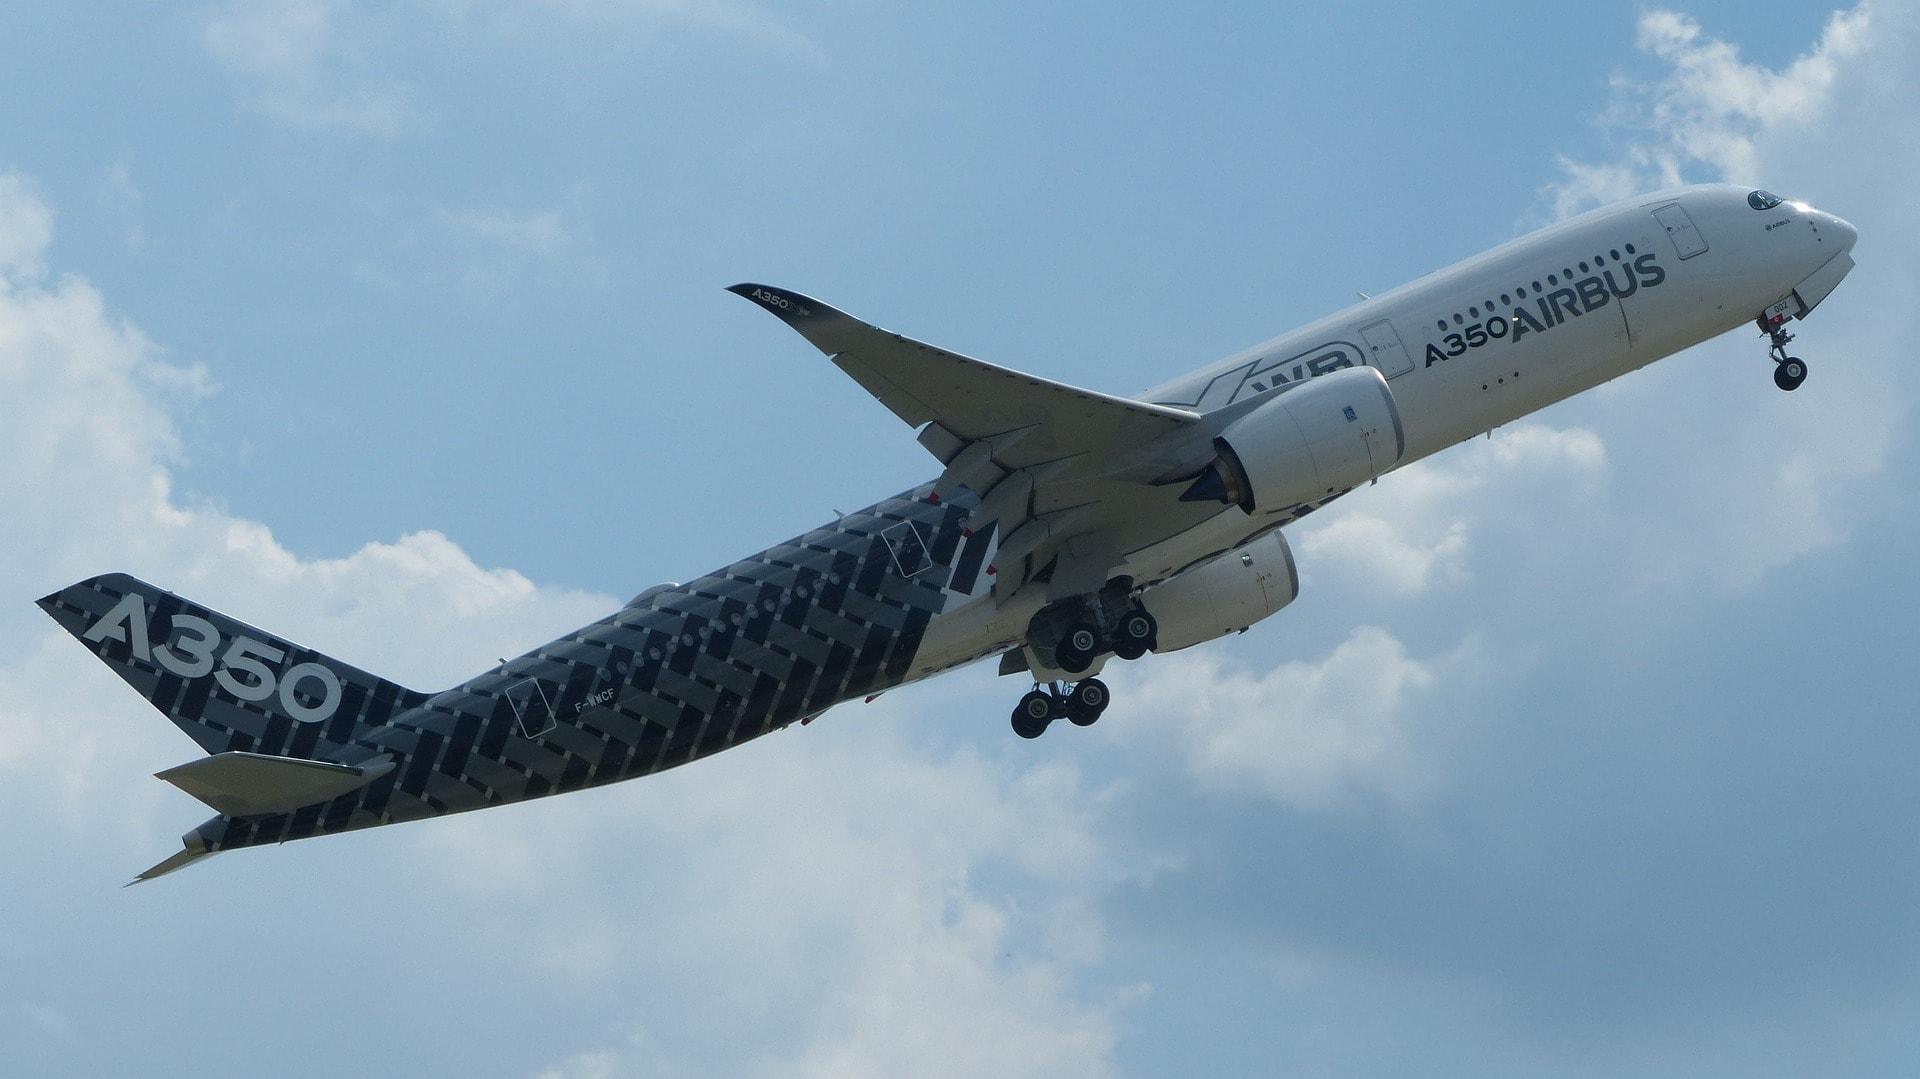 L'airbus A350 XWB au décollage